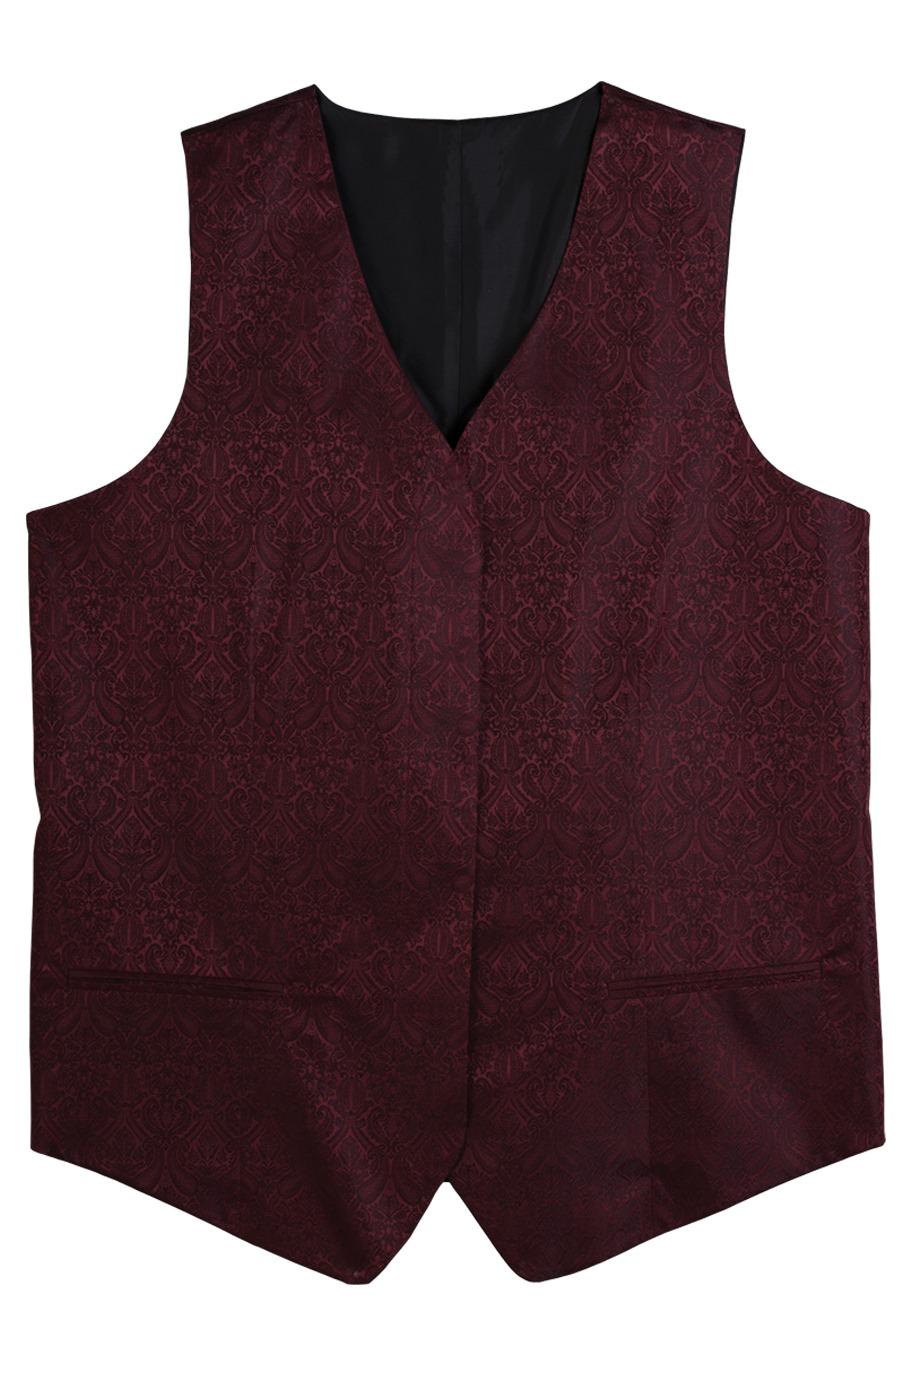 Edwards Garment 7491 - Women's Fly Front Paisley Vest